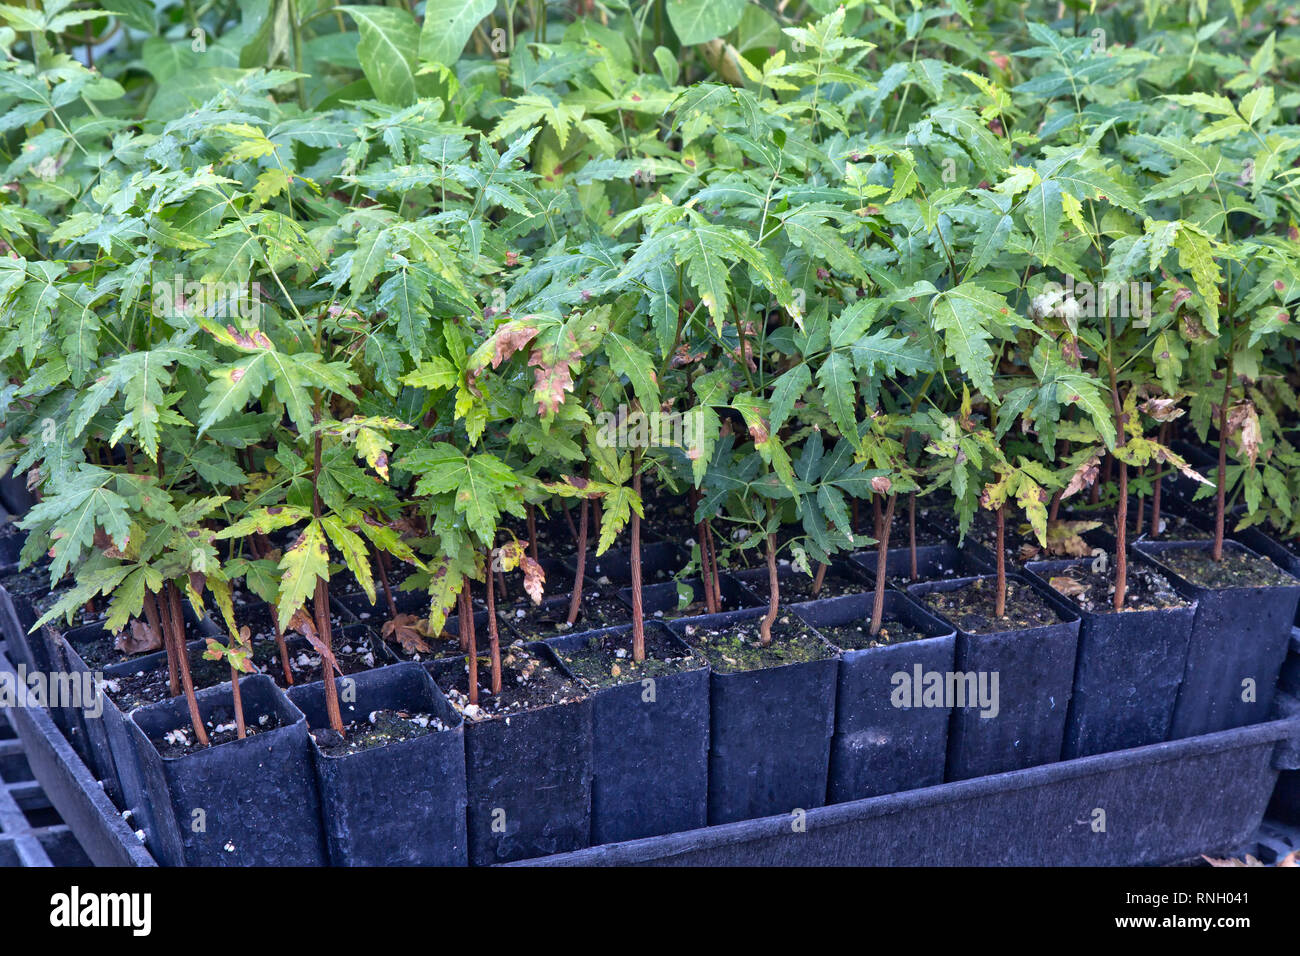 Neem  'Azadirachta indica' cuttings growing in pots, greenhouse. - Stock Image